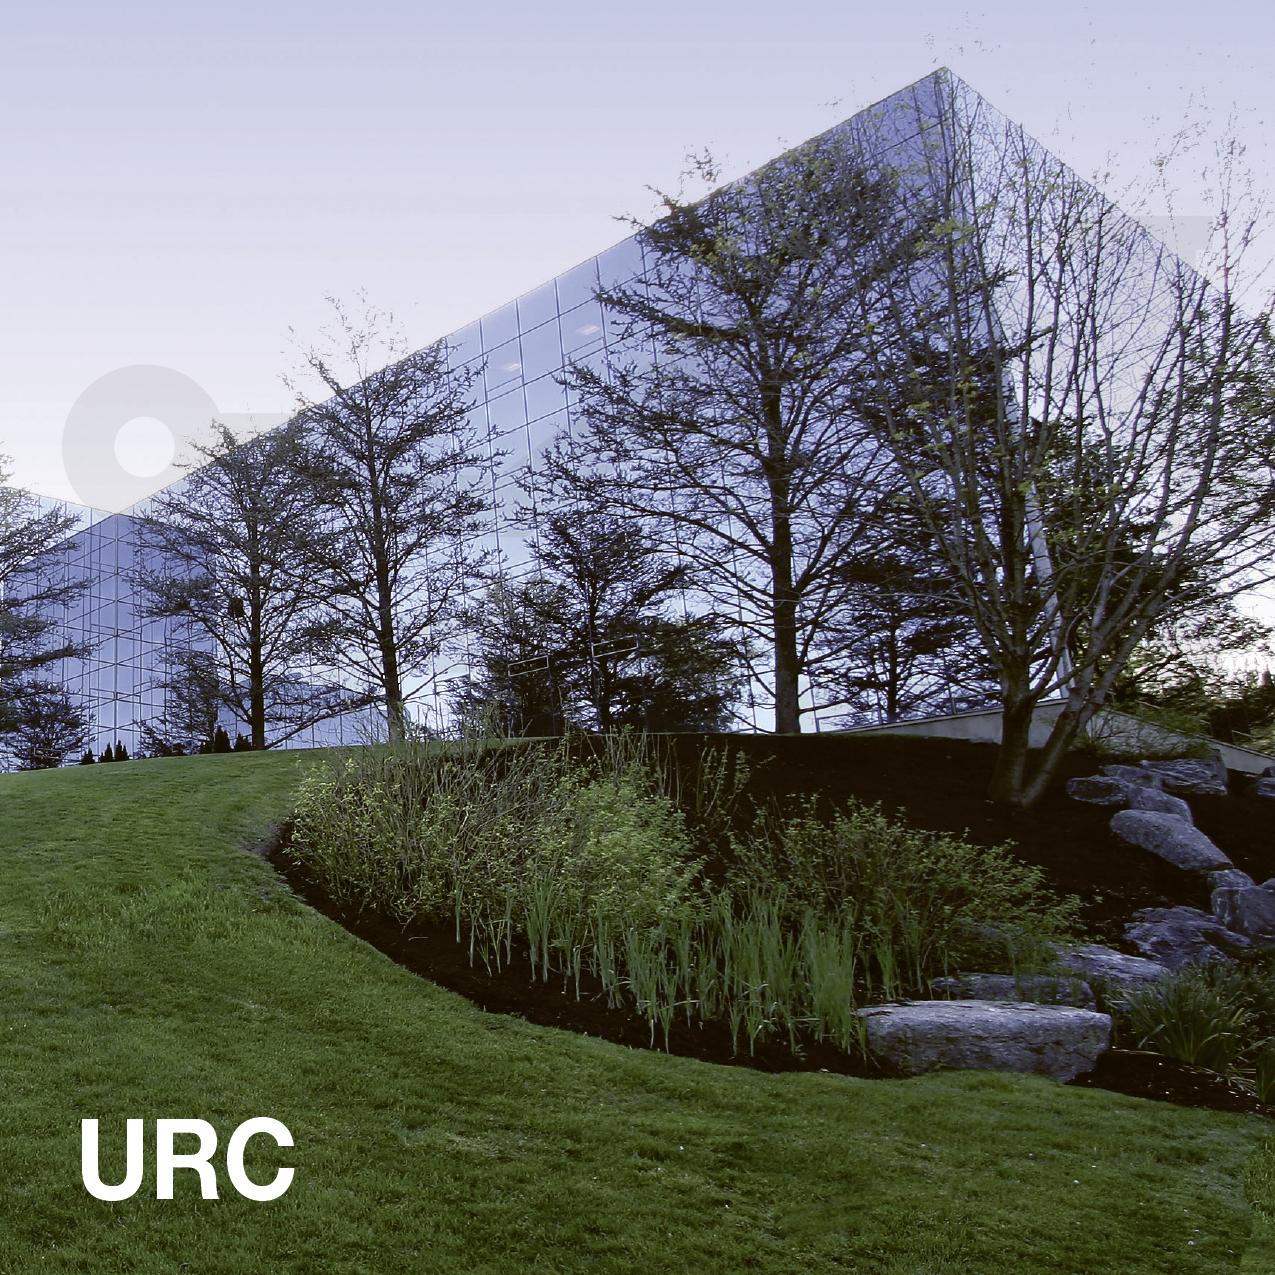 URC_Total_Control_ottosystem-22